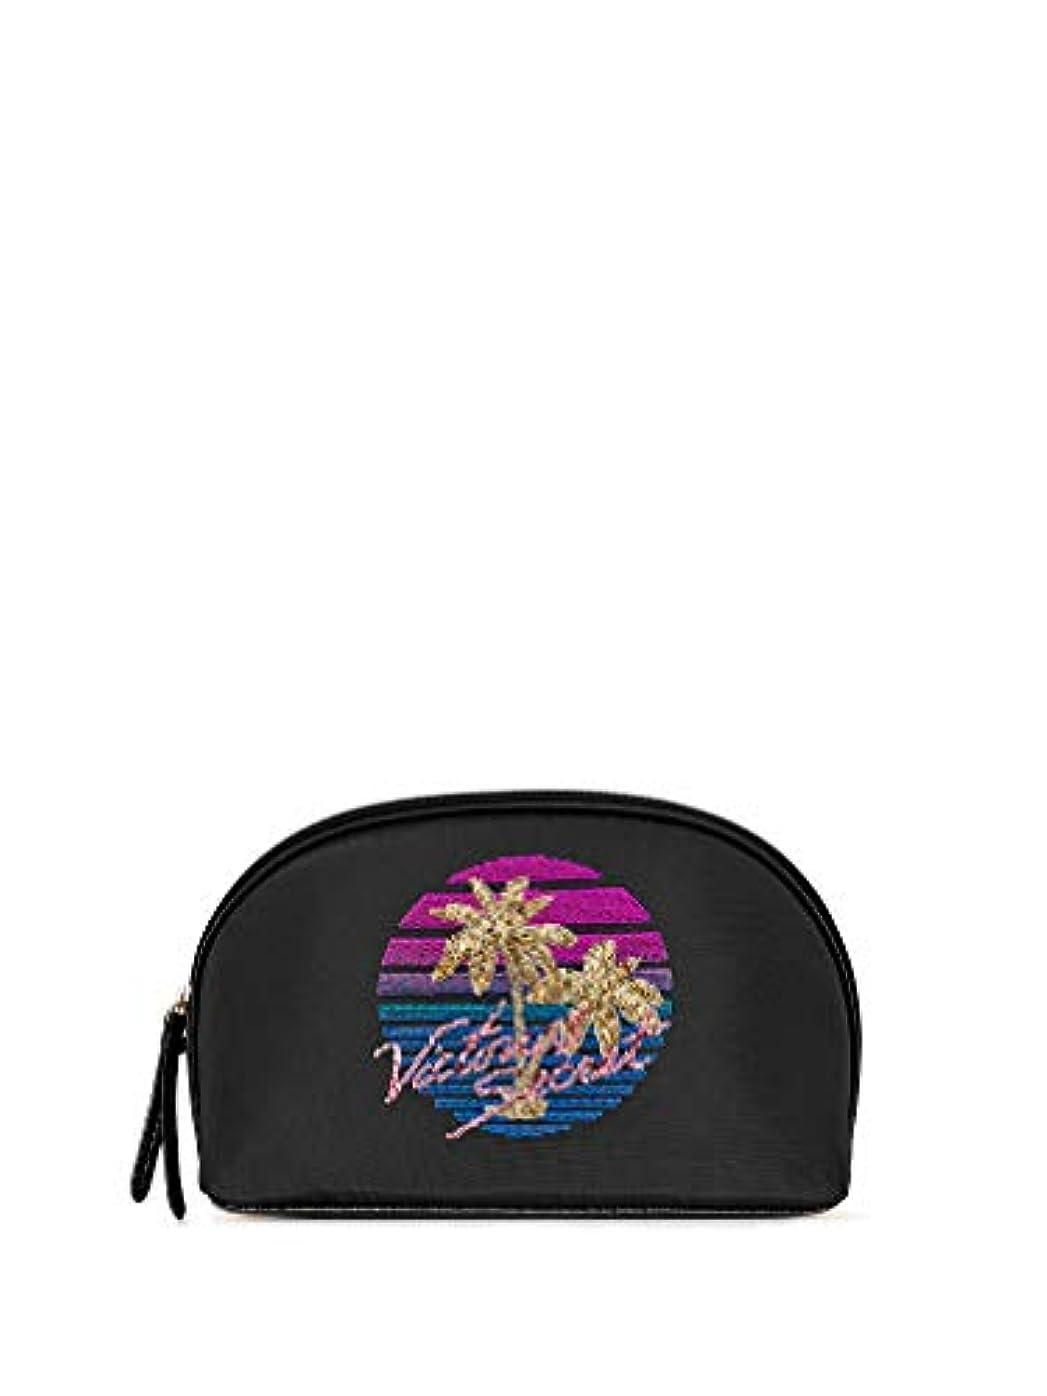 Victoria's Secret ヴィクトリアシークレット VS パームツリー トラベル用 ビッグ 化粧ポーチ